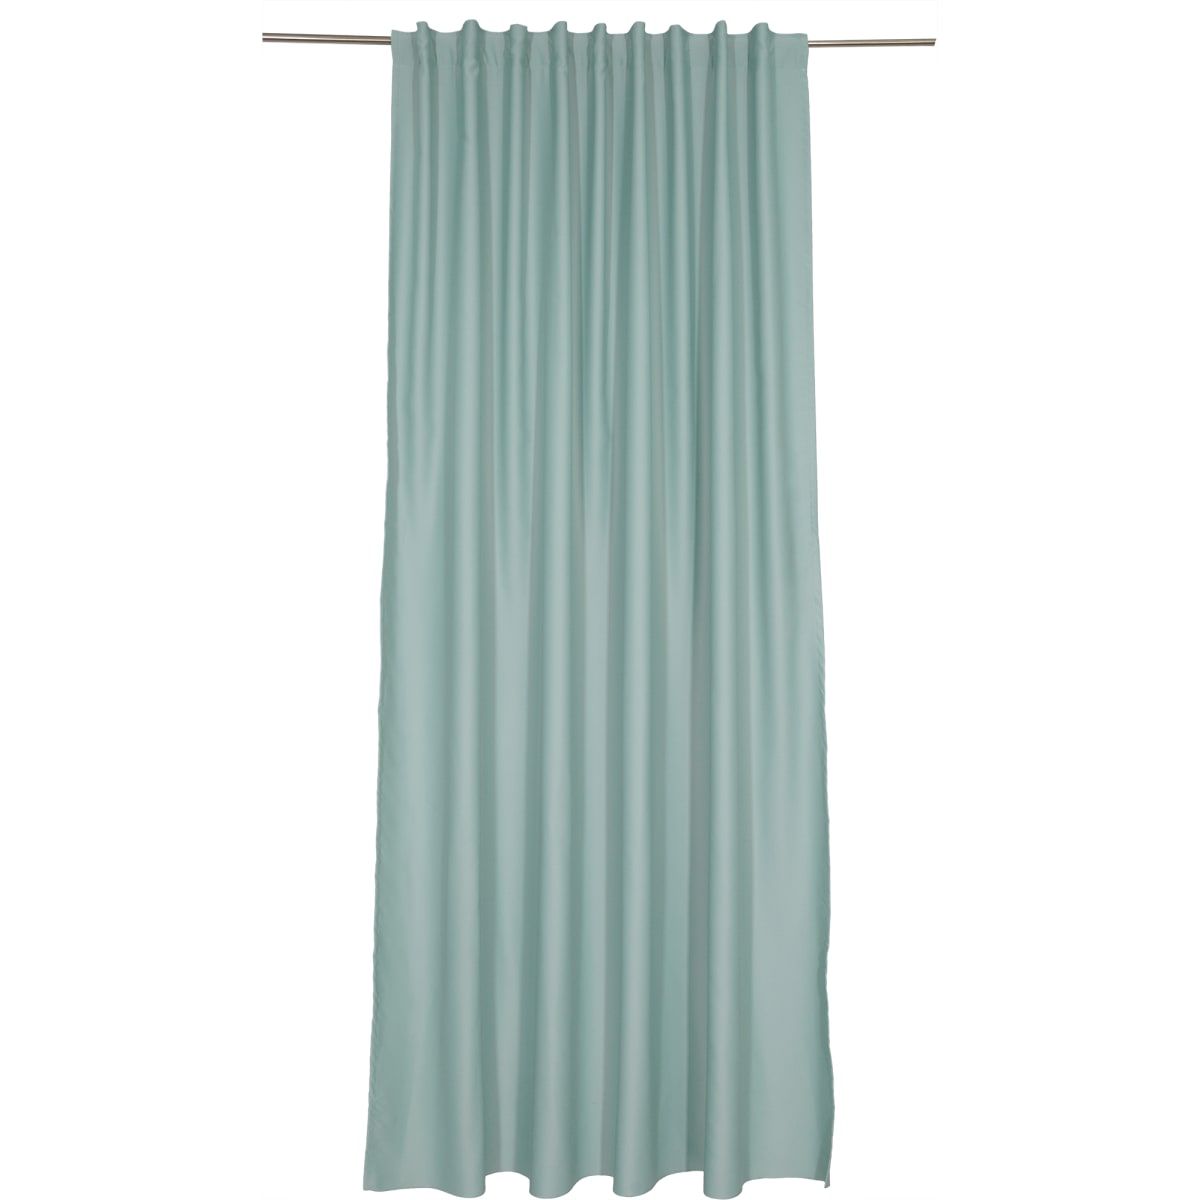 Штора на ленте «Ночь» 200х280 см цвет серо-голубой